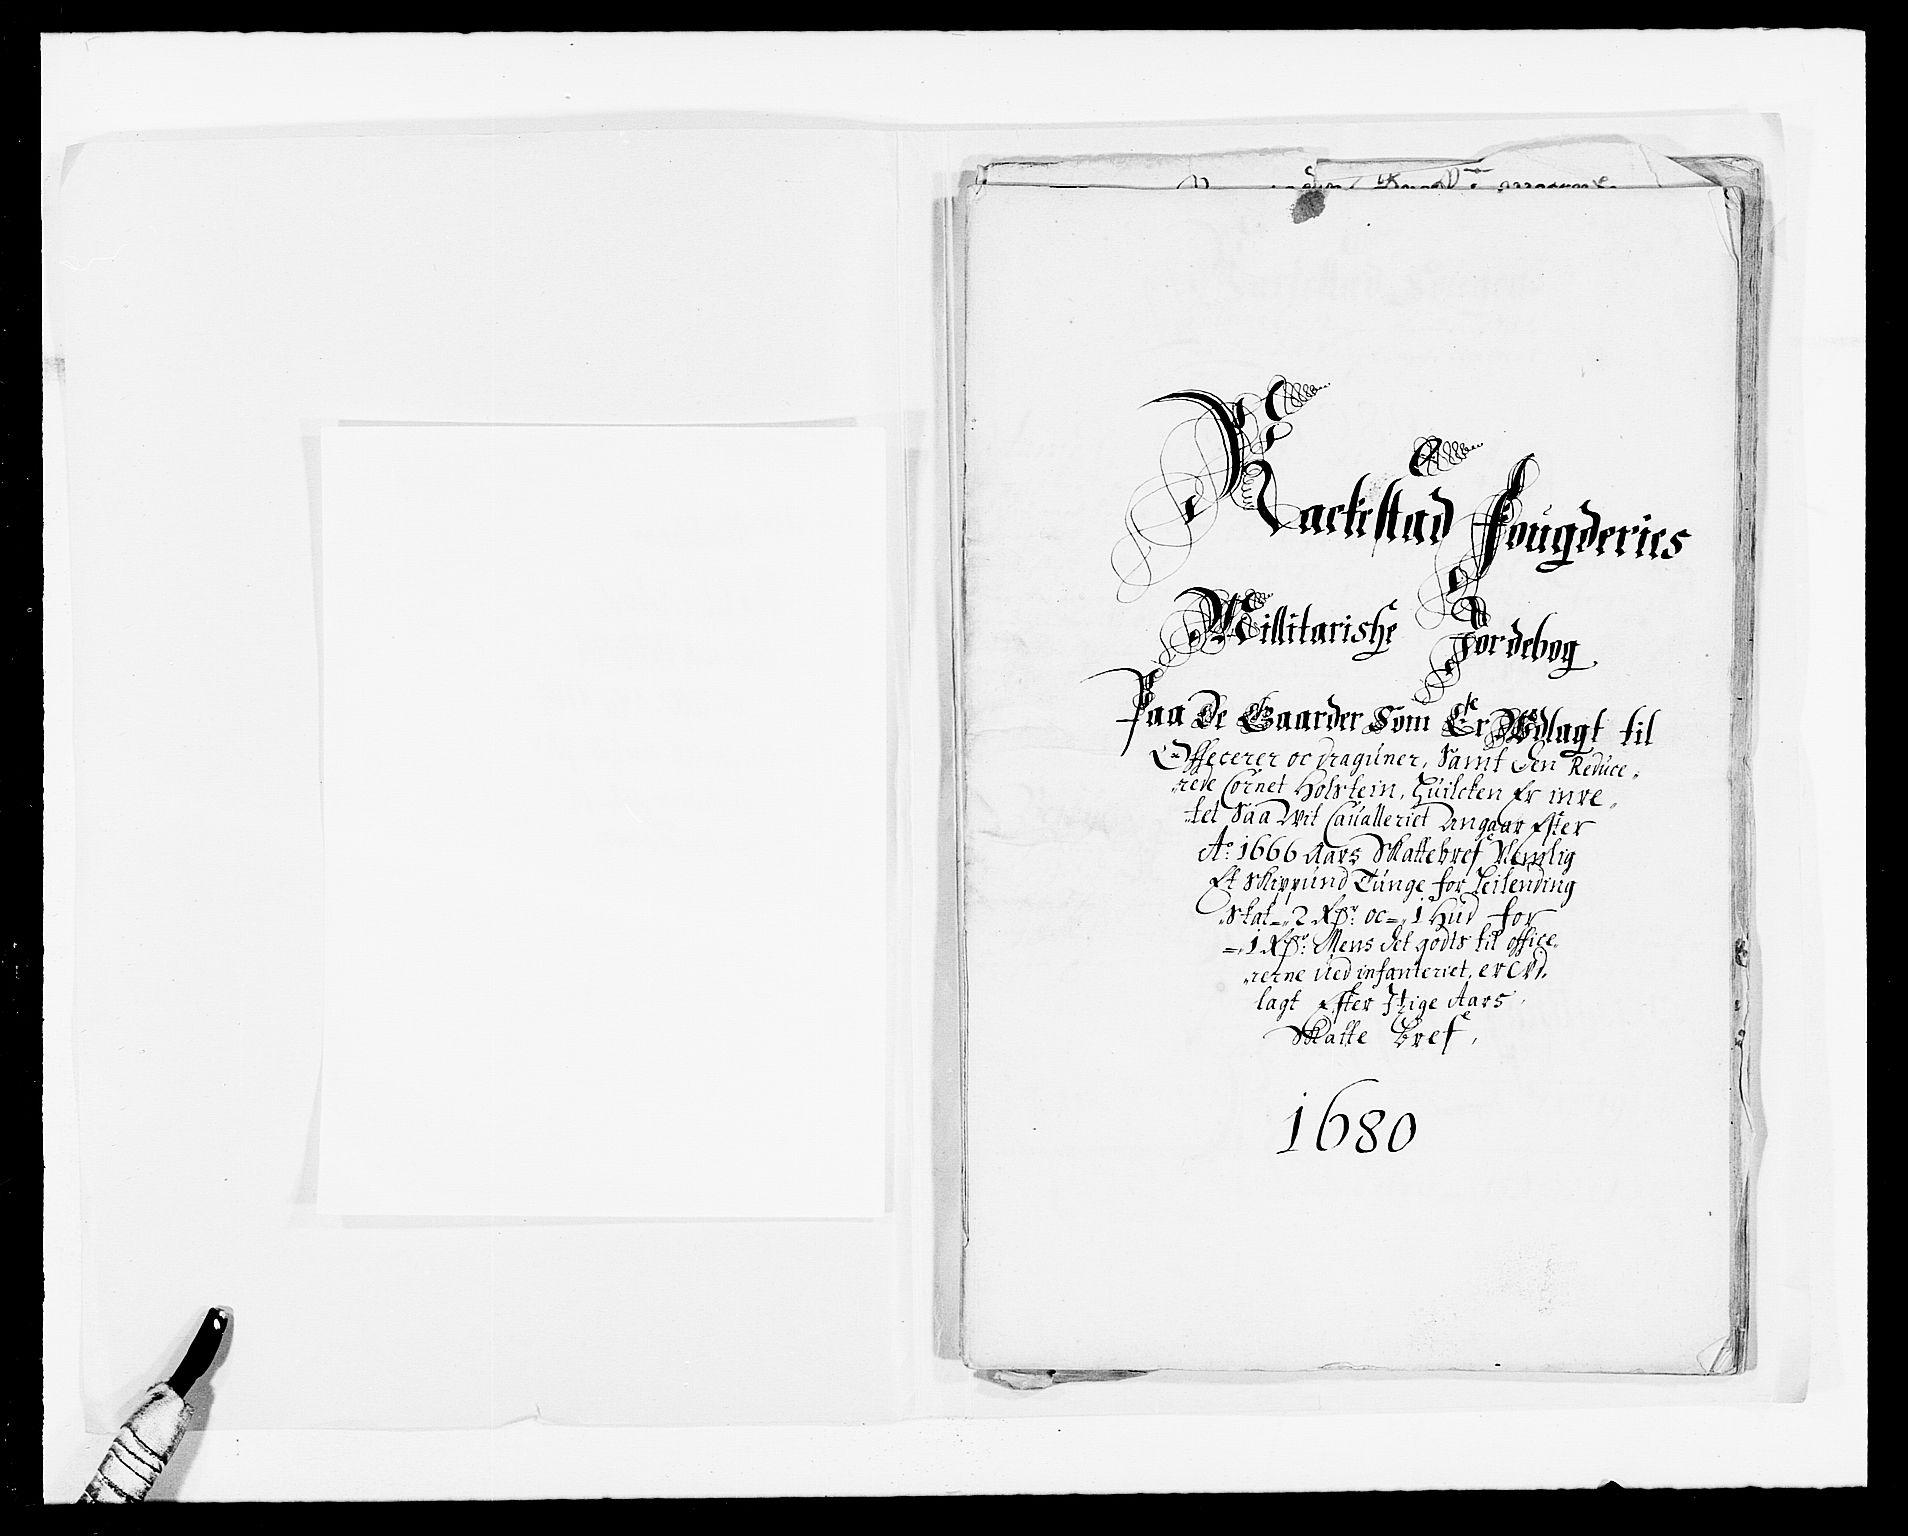 RA, Rentekammeret inntil 1814, Reviderte regnskaper, Fogderegnskap, R05/L0272: Fogderegnskap Rakkestad, 1680-1681, s. 404